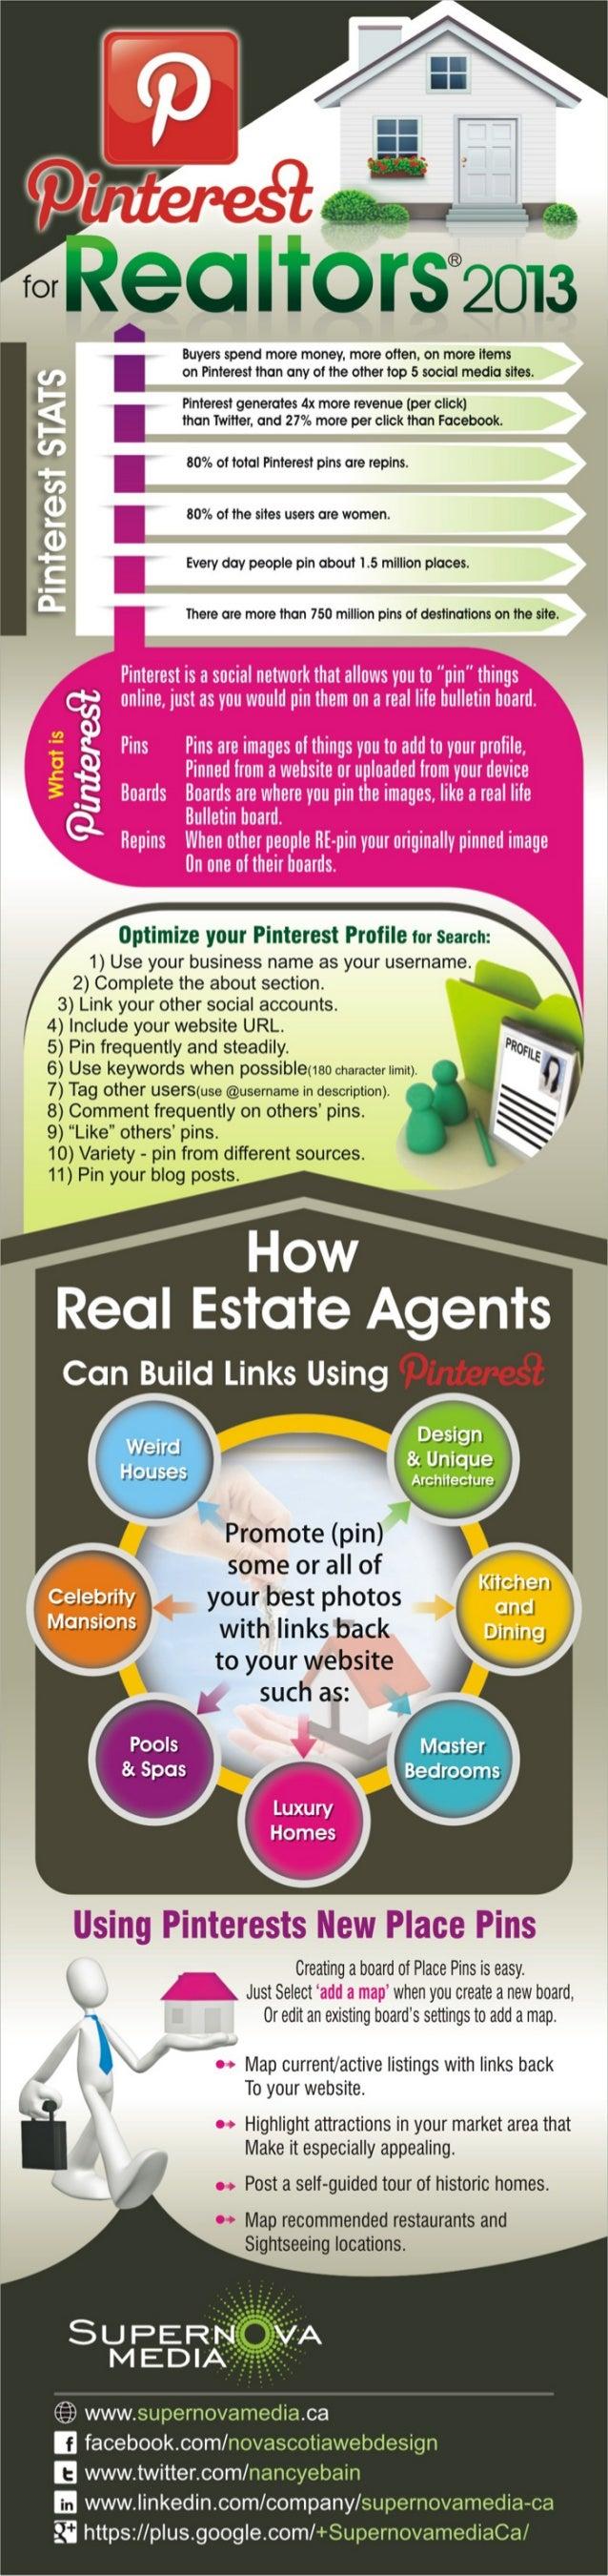 Pinterest for Real Estate Agents